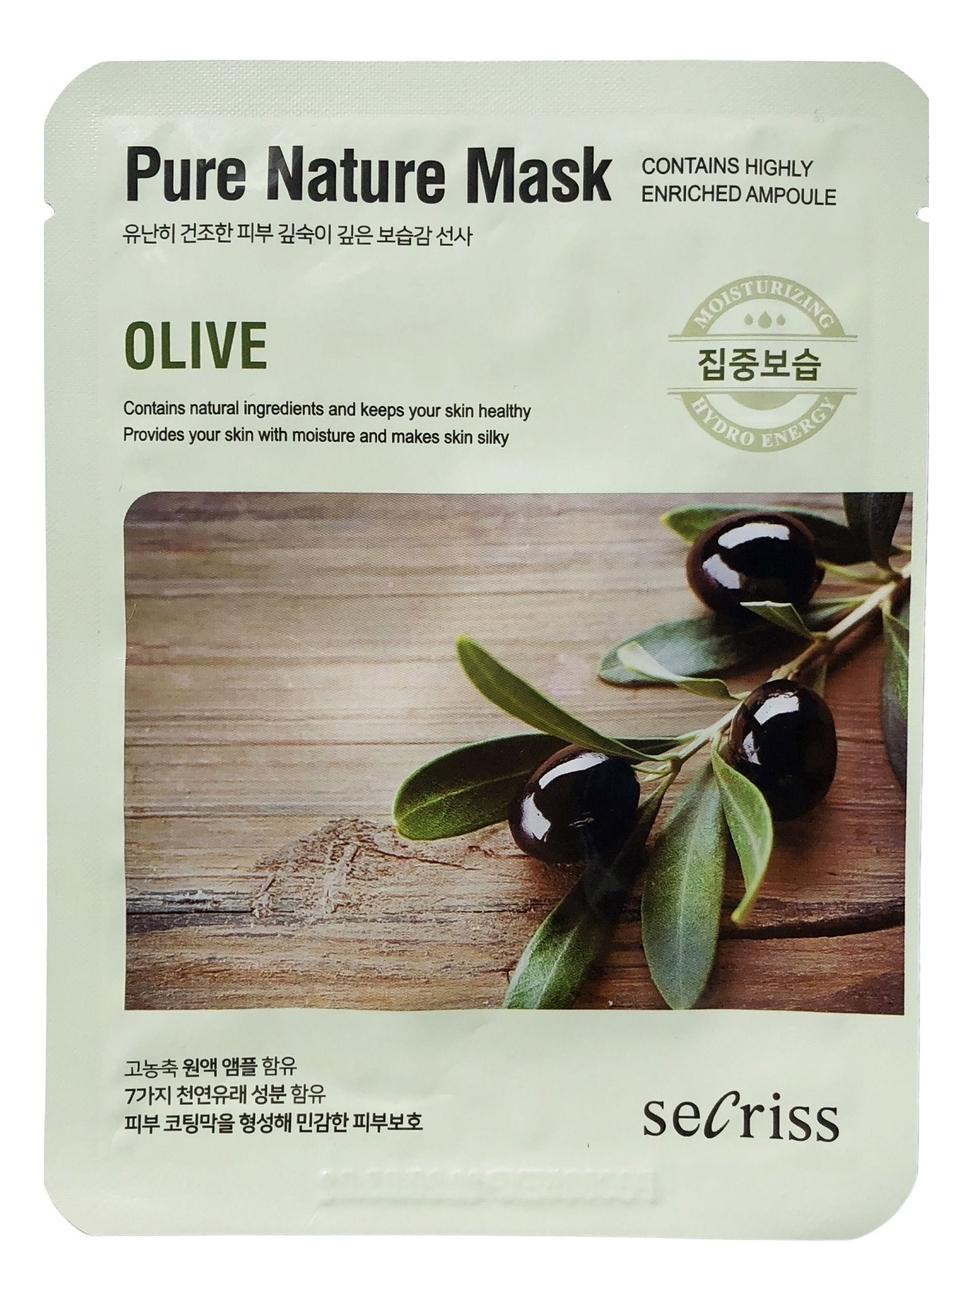 Тканевая маска для лица с экстрактом оливы Secriss Pure Nature Mask Olive 25мл